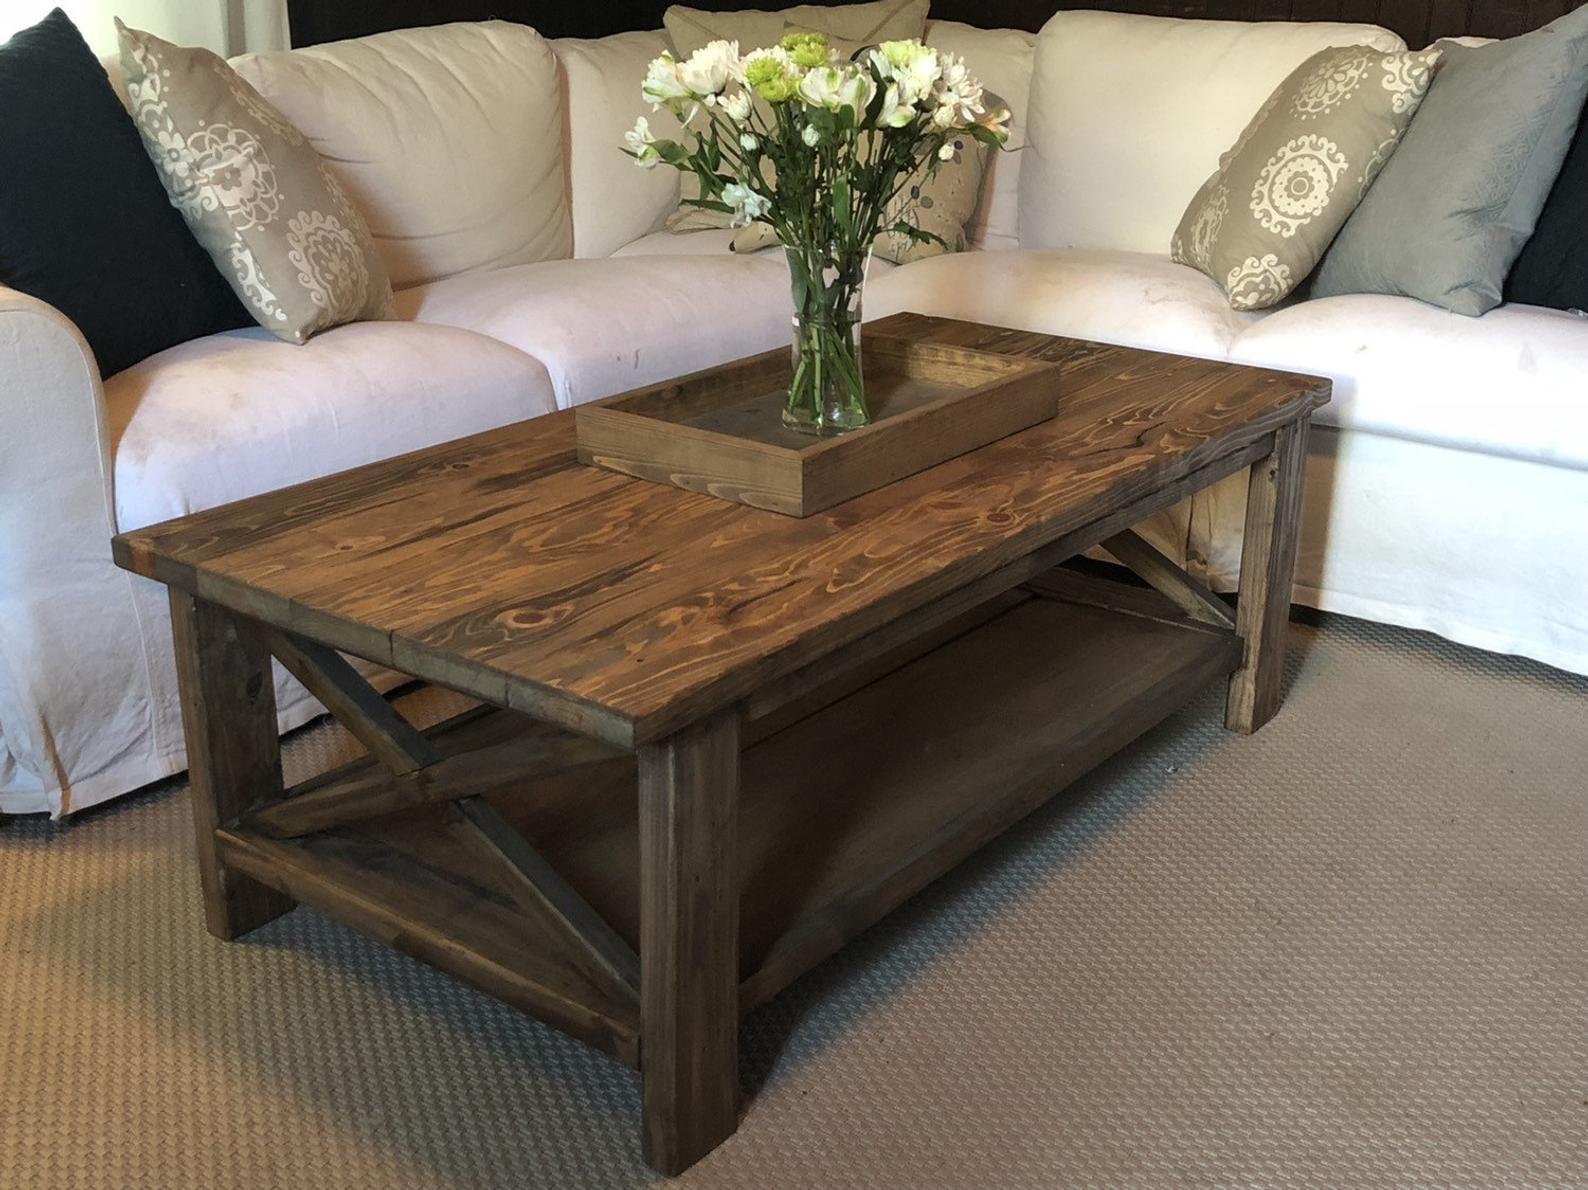 Rustic Farmhousestyle Coffee Table in 2020 Farmhouse